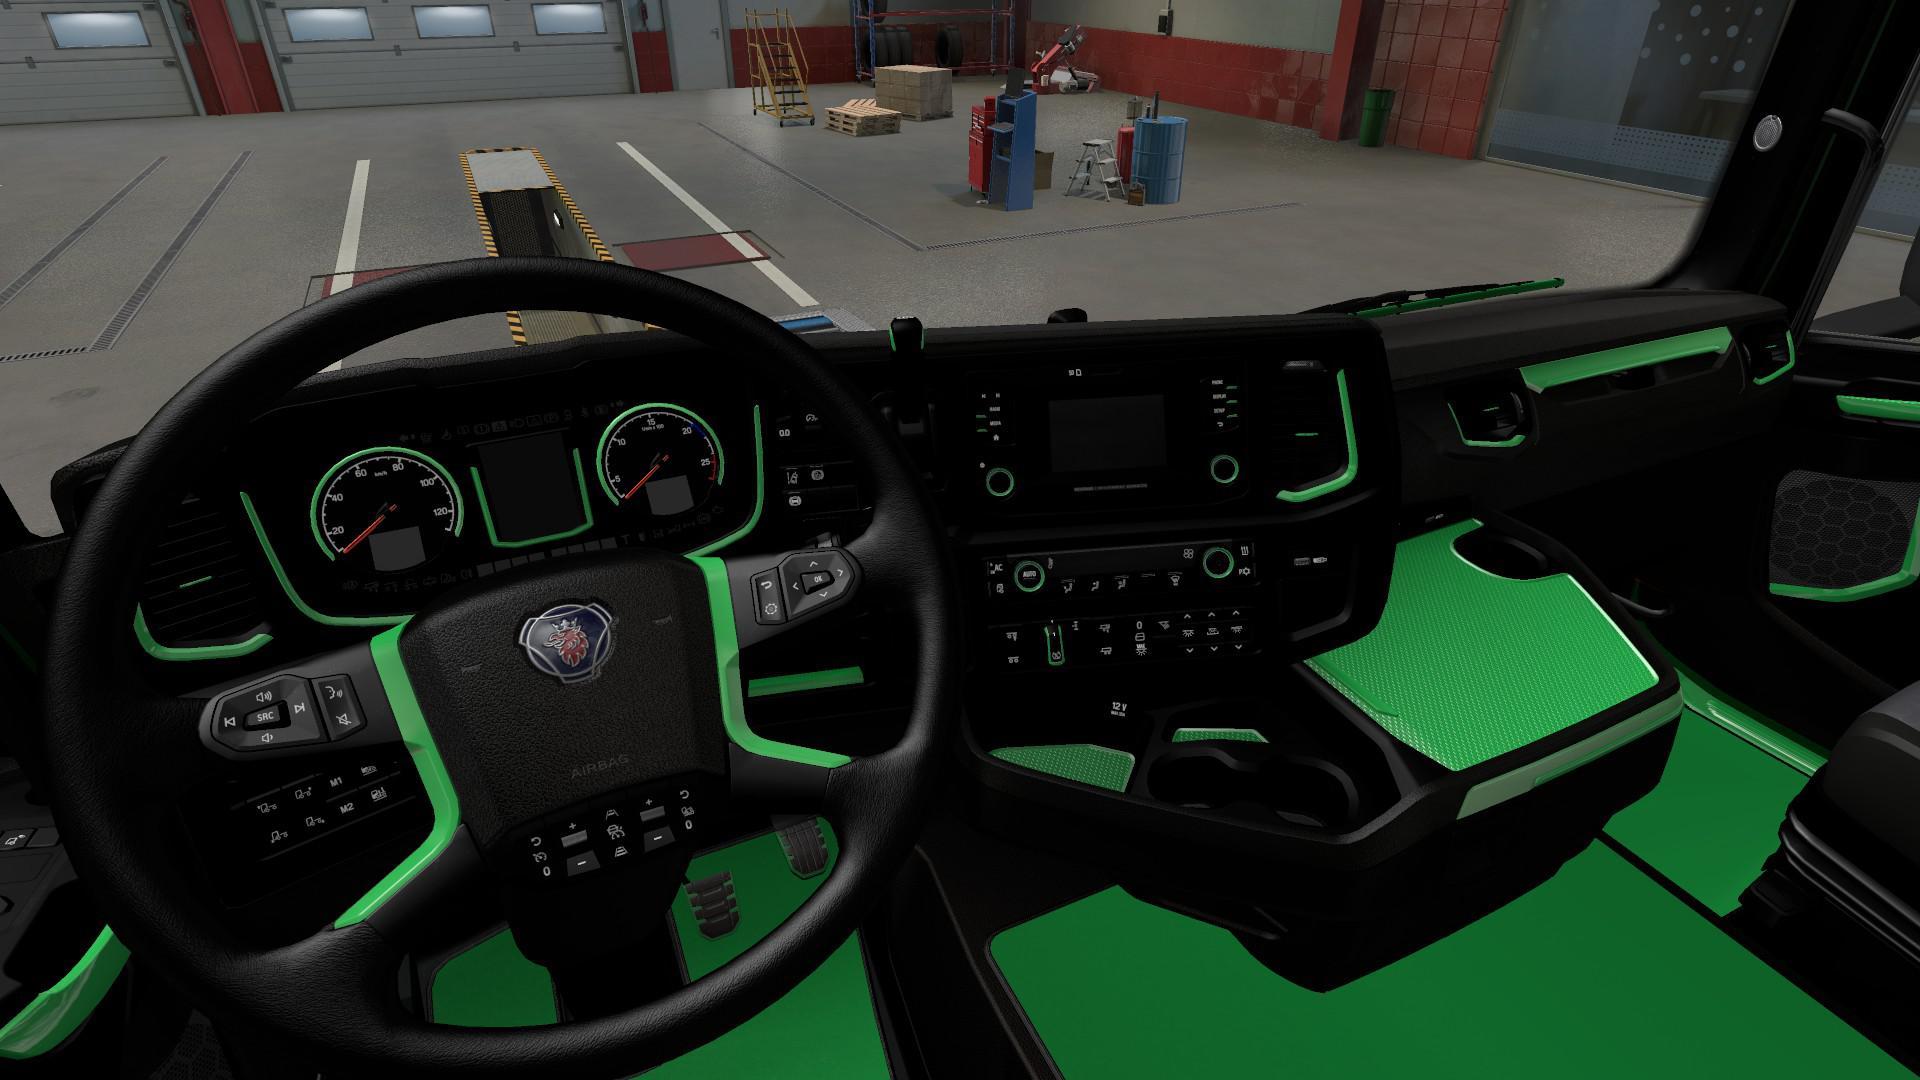 ETS2 - Green Interior for Scania 2016 V1.0 (1.40.x)